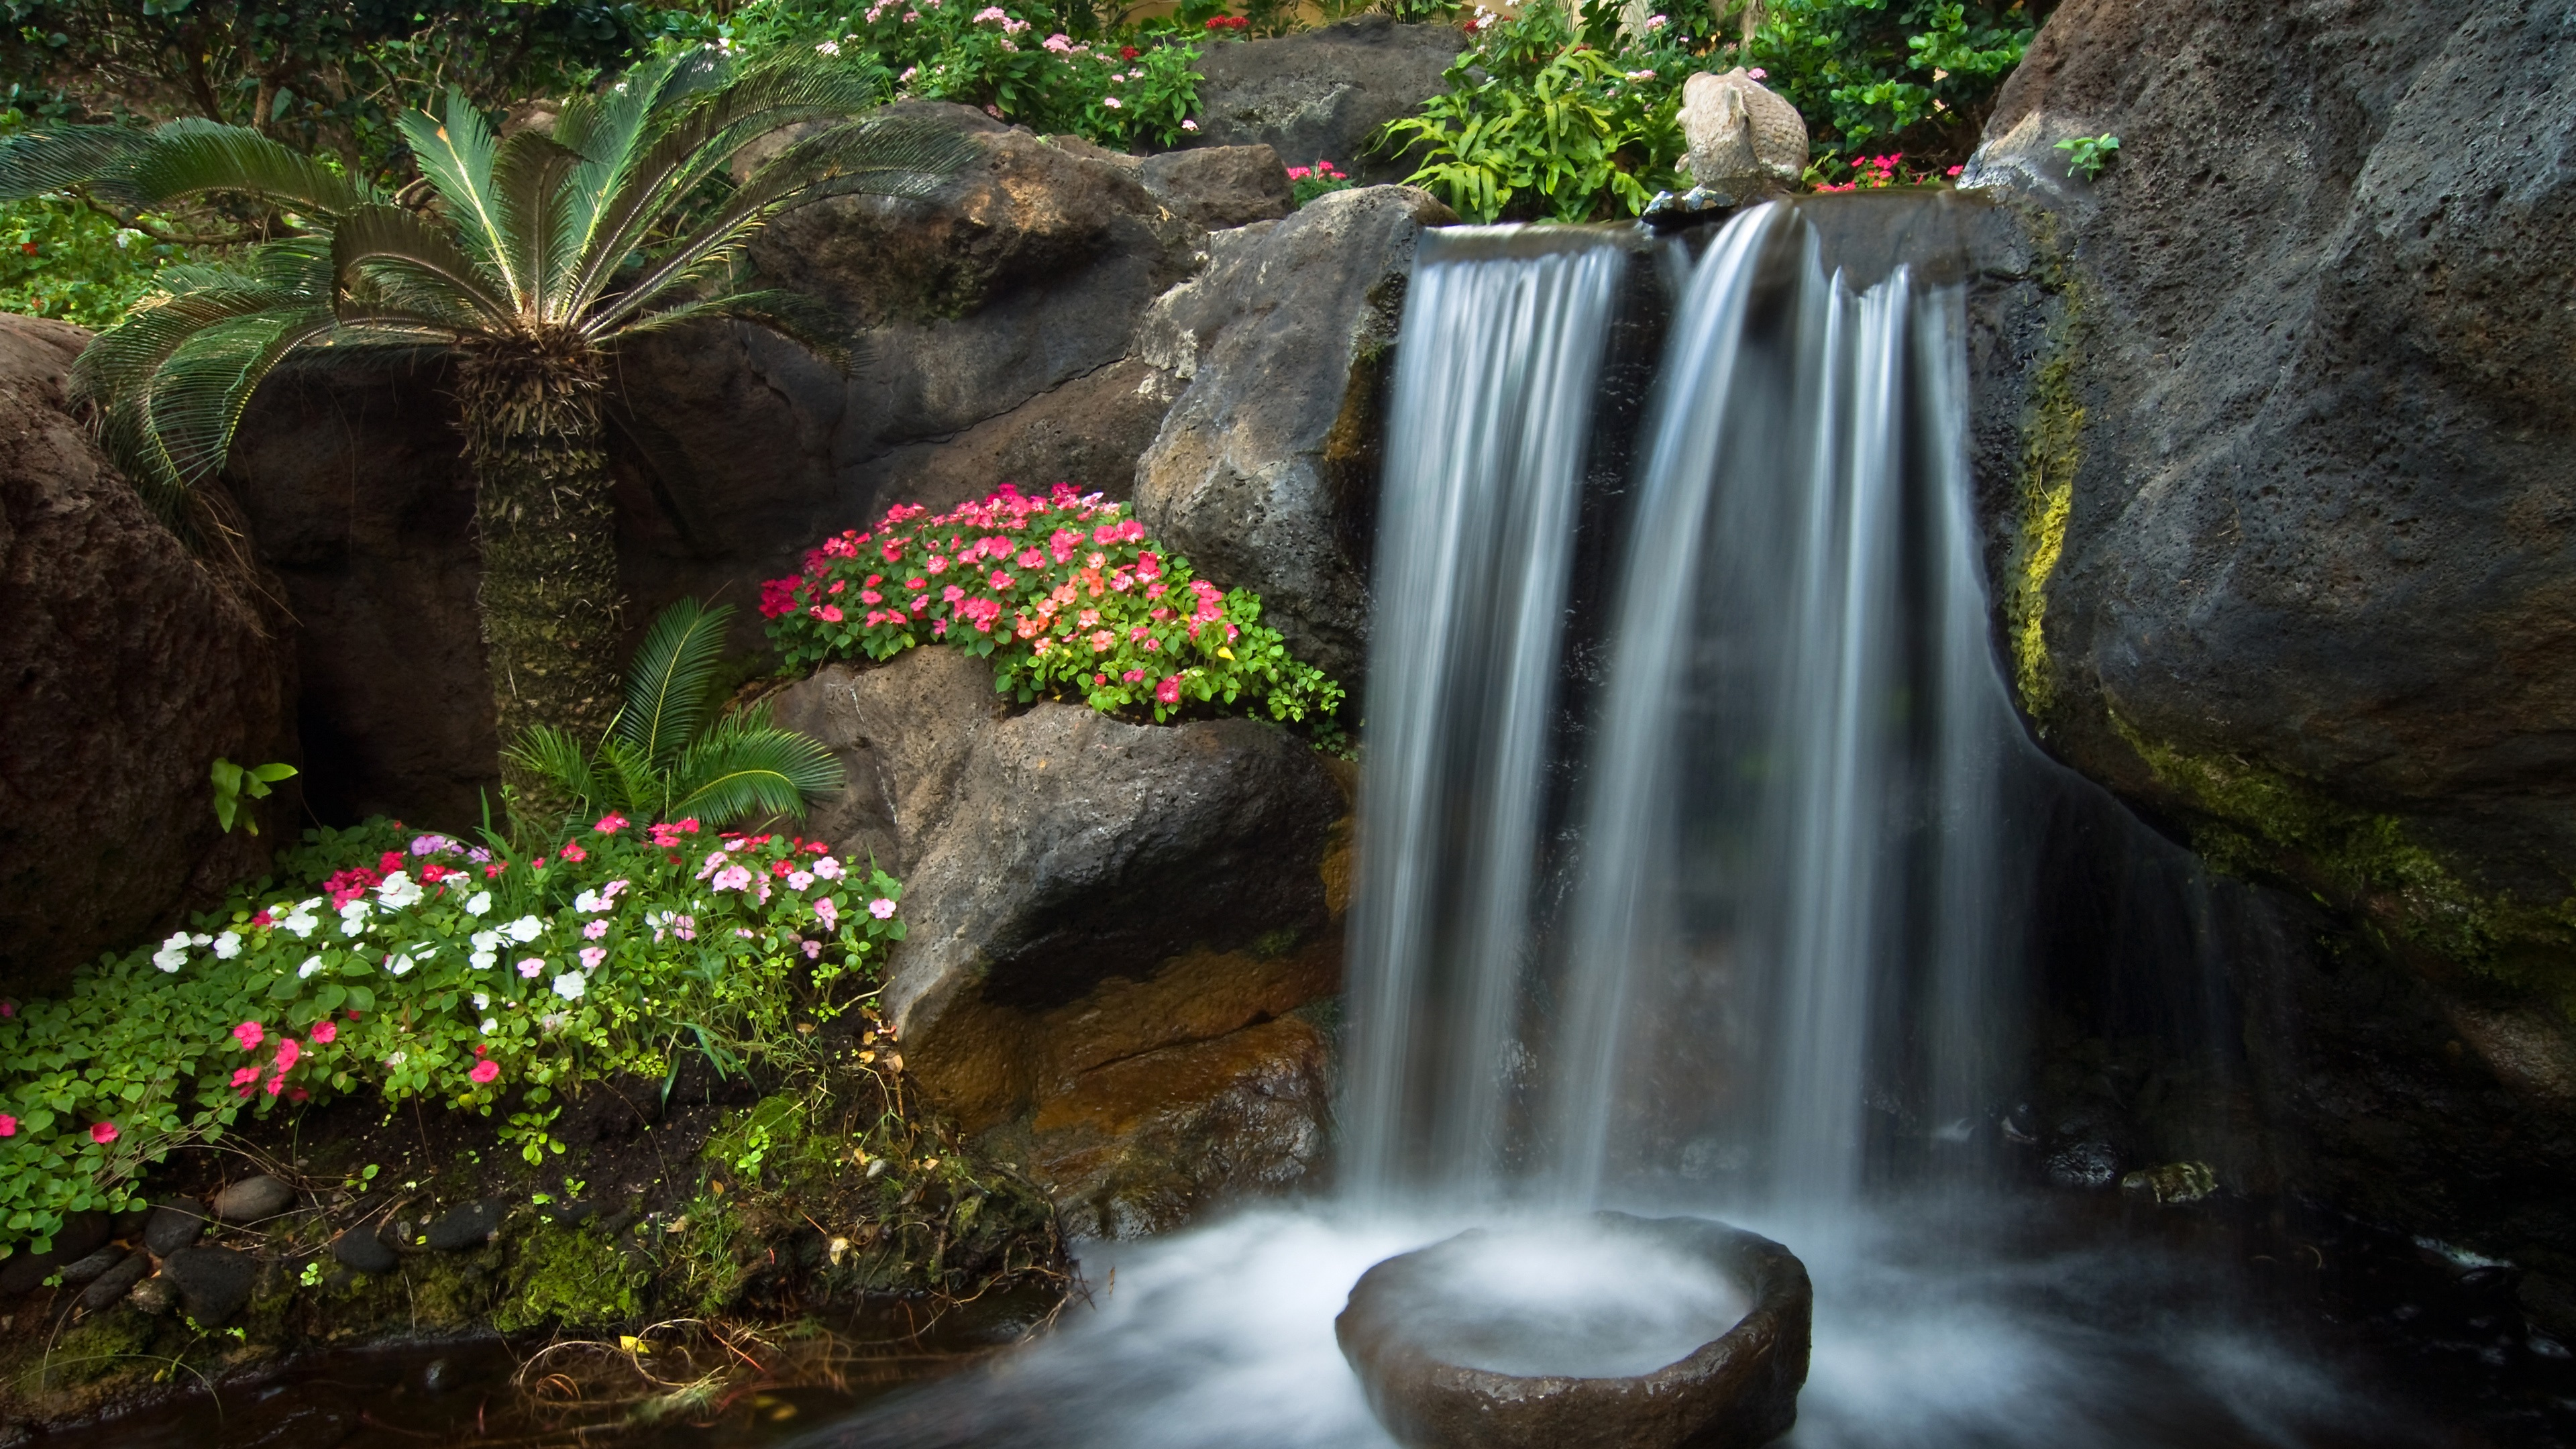 3840x2160 uhd 4k - Paisajes y jardines ...